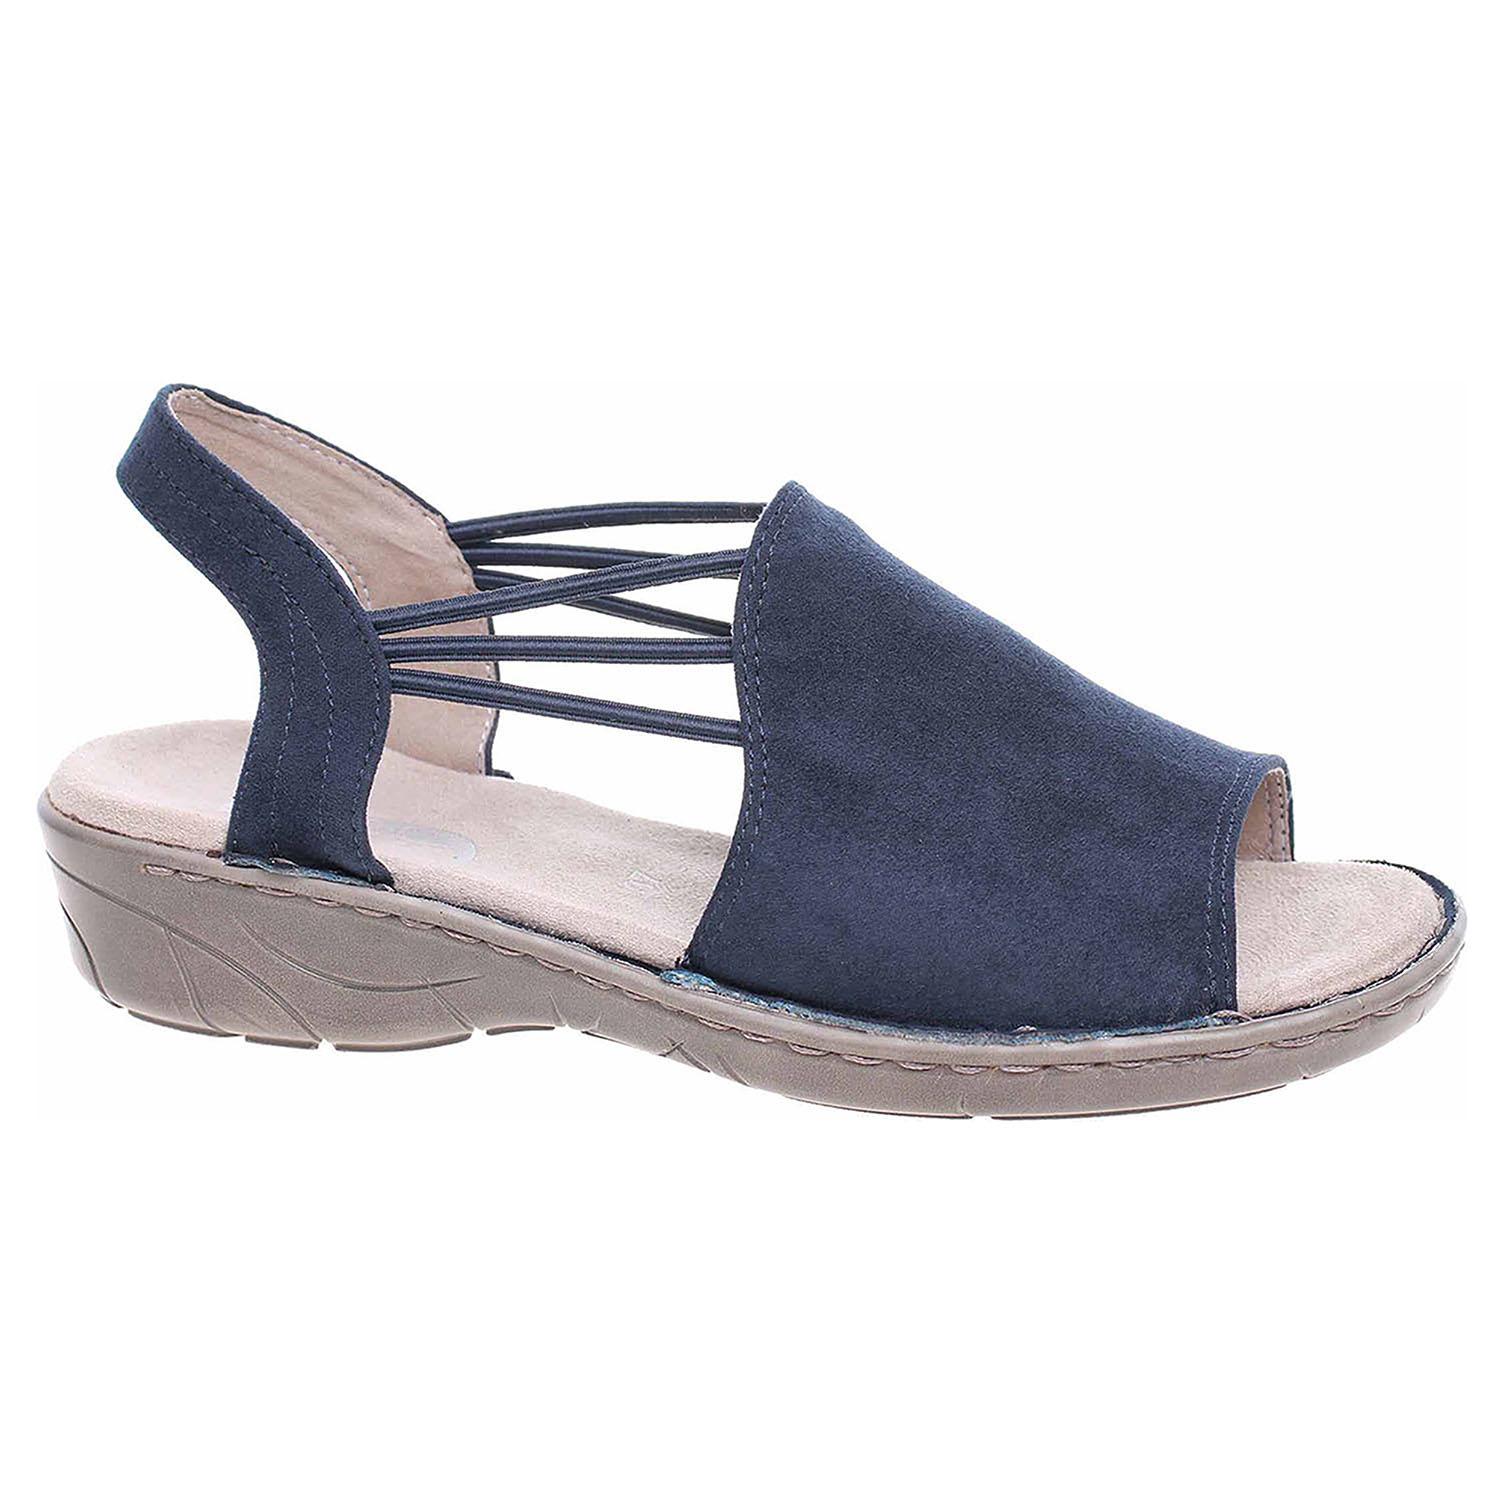 5aae7623bd Ecco Dámské sandály Ara 22-57283-84 blau 23801279